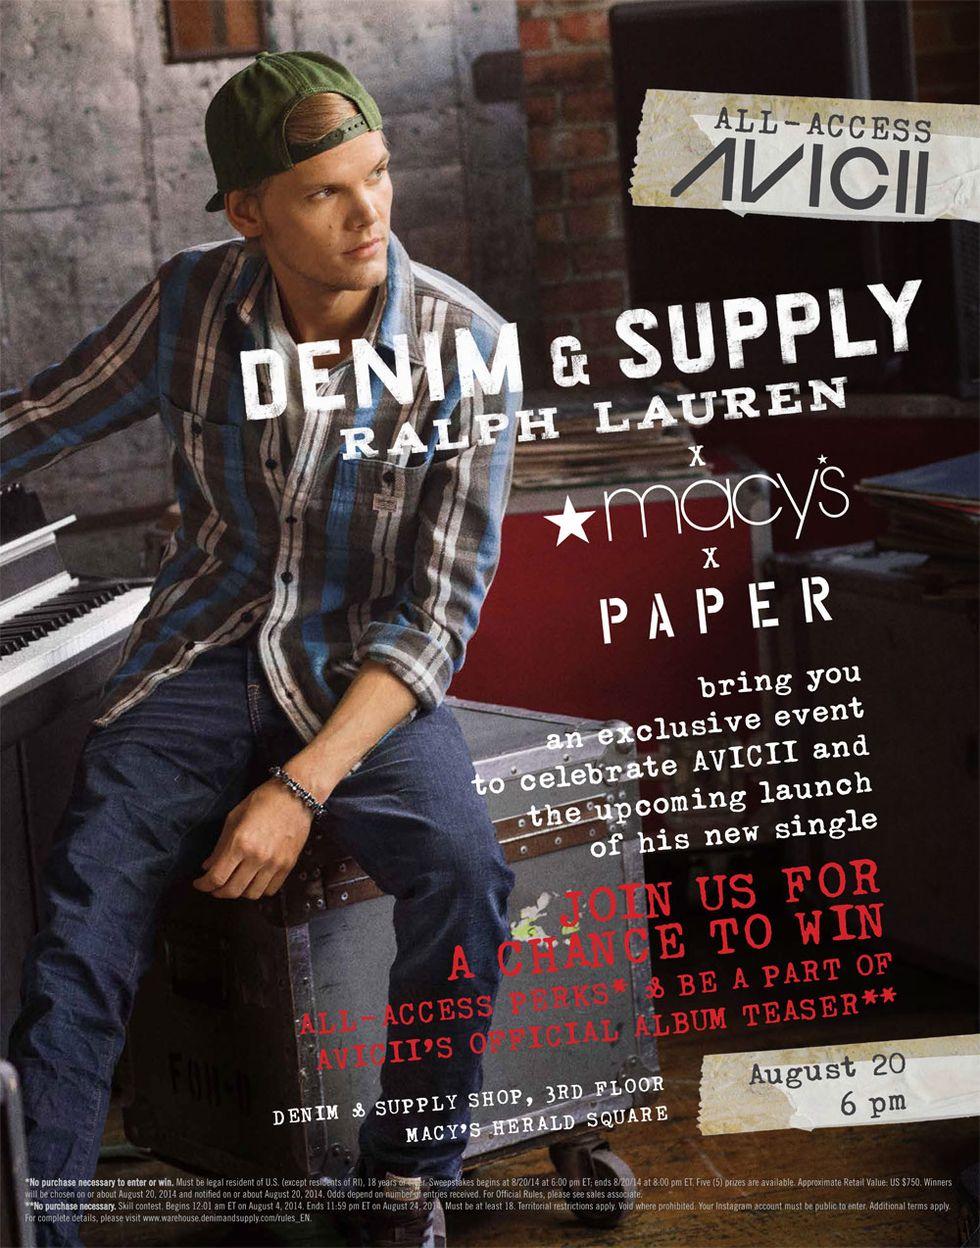 Celebrate AVICII with PAPER, Denim & Supply Ralph Lauren, and Macy's